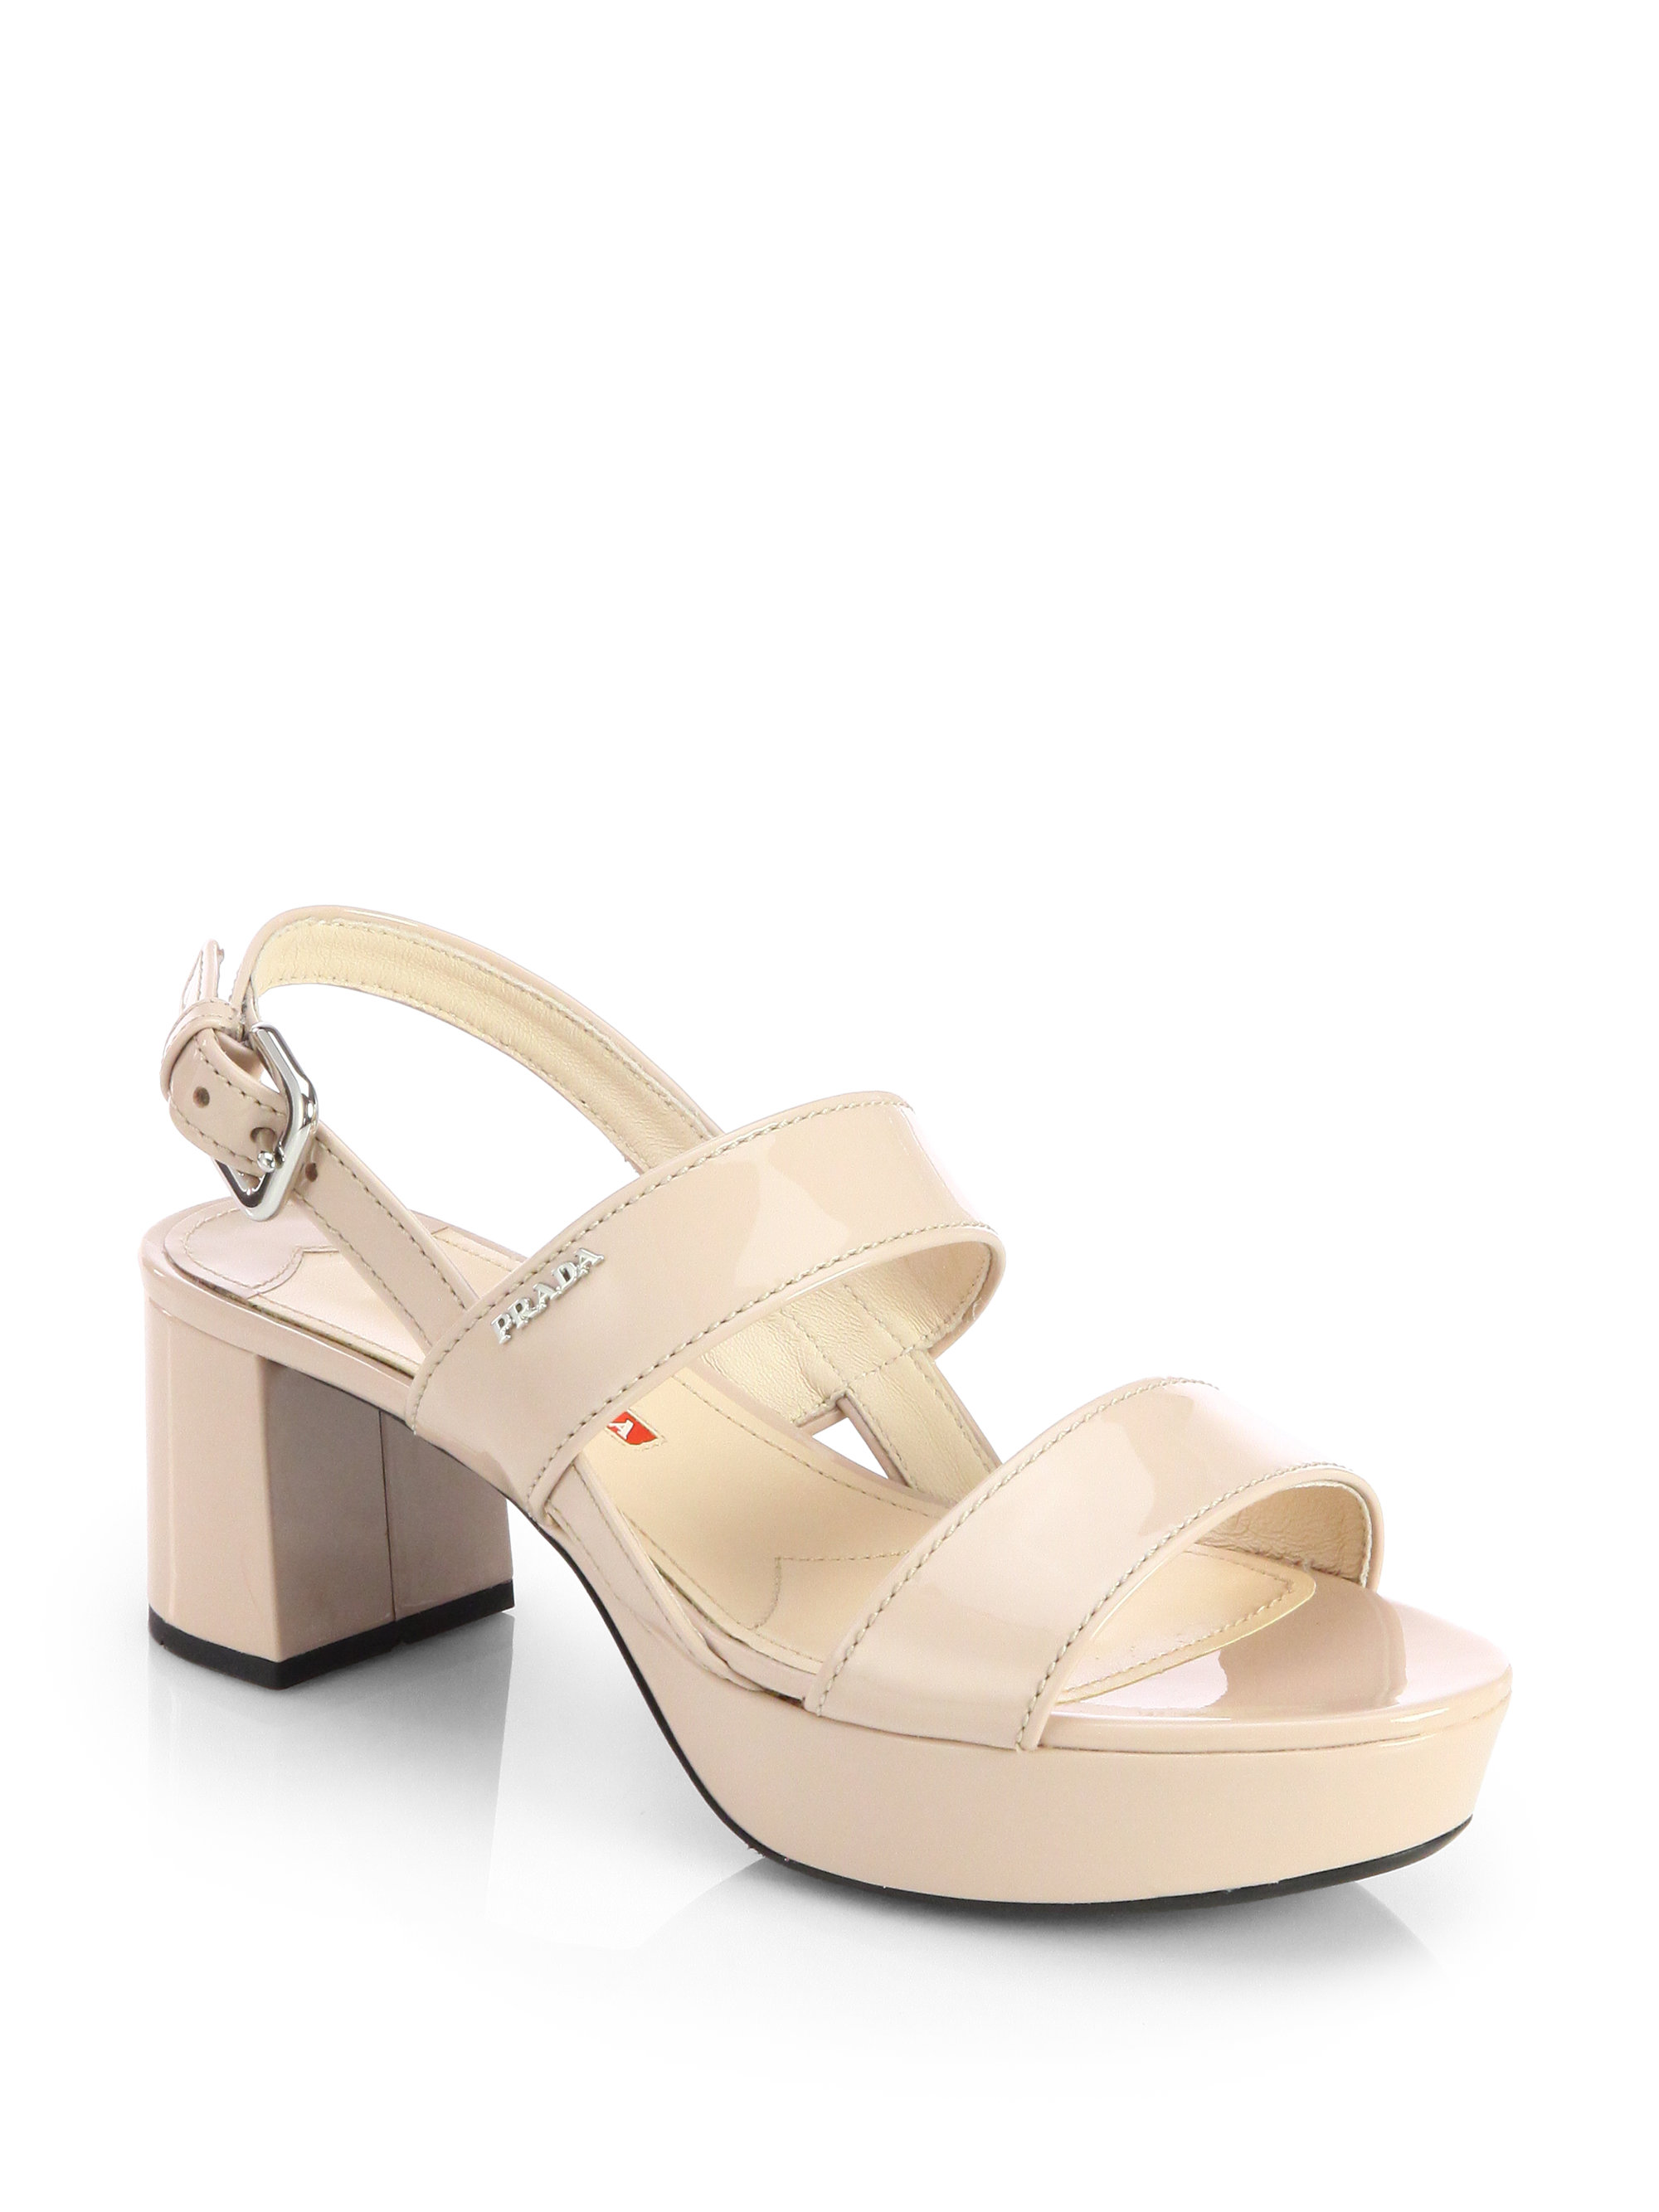 Prada Patent Leather Block Heel Sandals In Beige Cipria